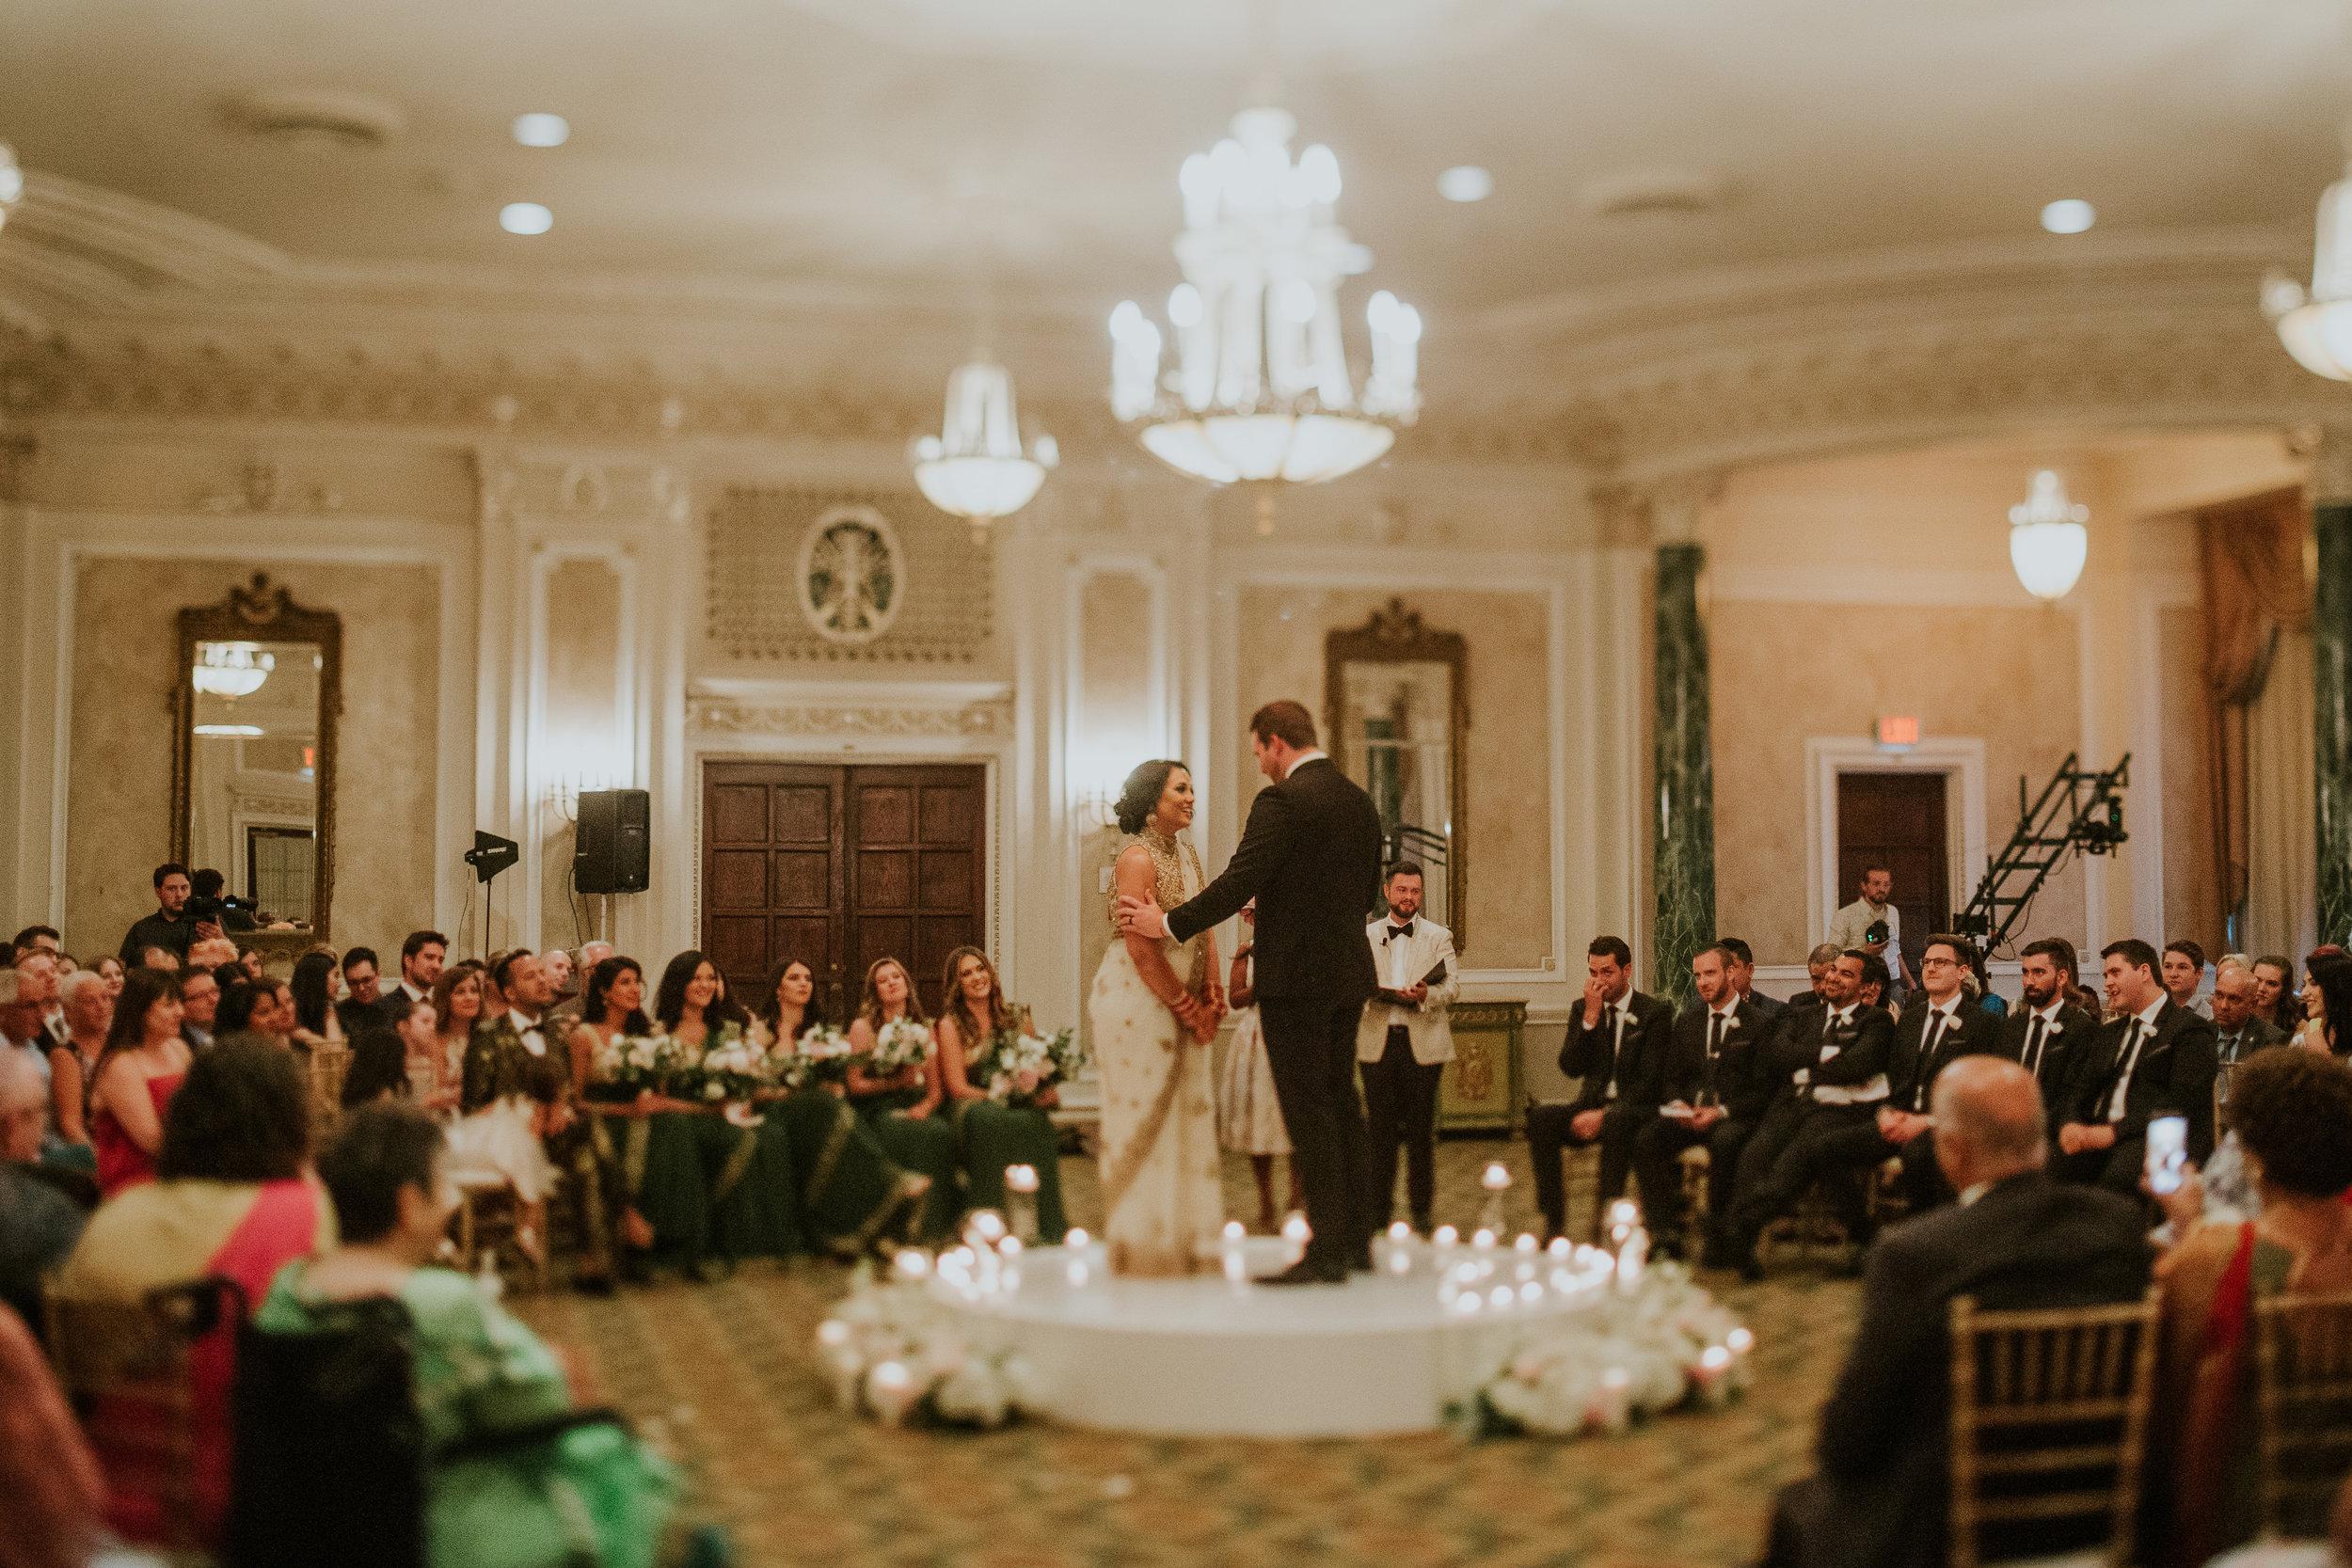 Komal Minhas Wedding Chateau Laurier, Toast Events, ceremony